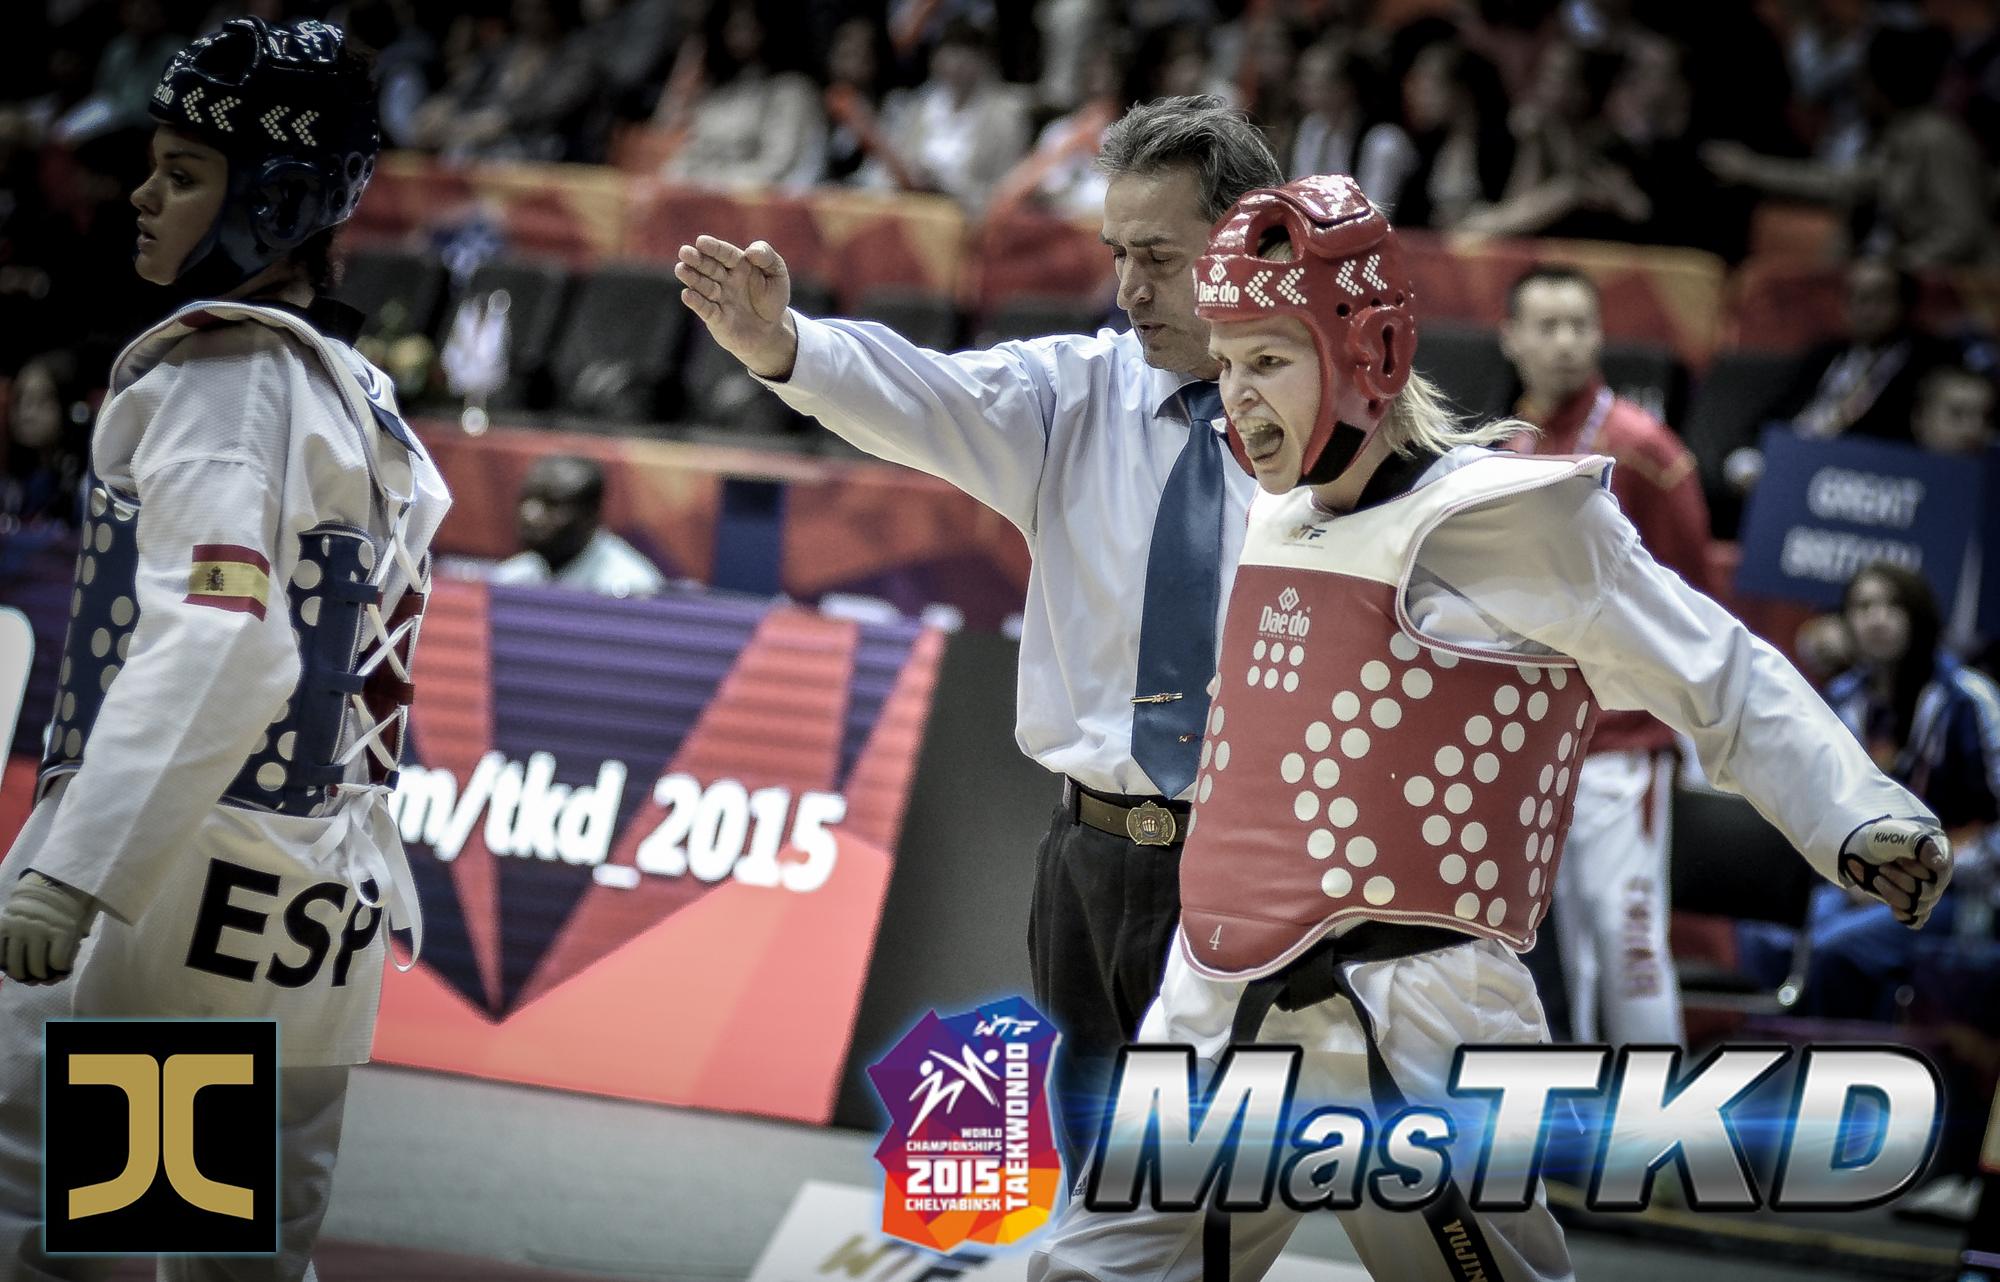 12_JCalicu-Mundial-Taekwondo-Mejores-Imagenes